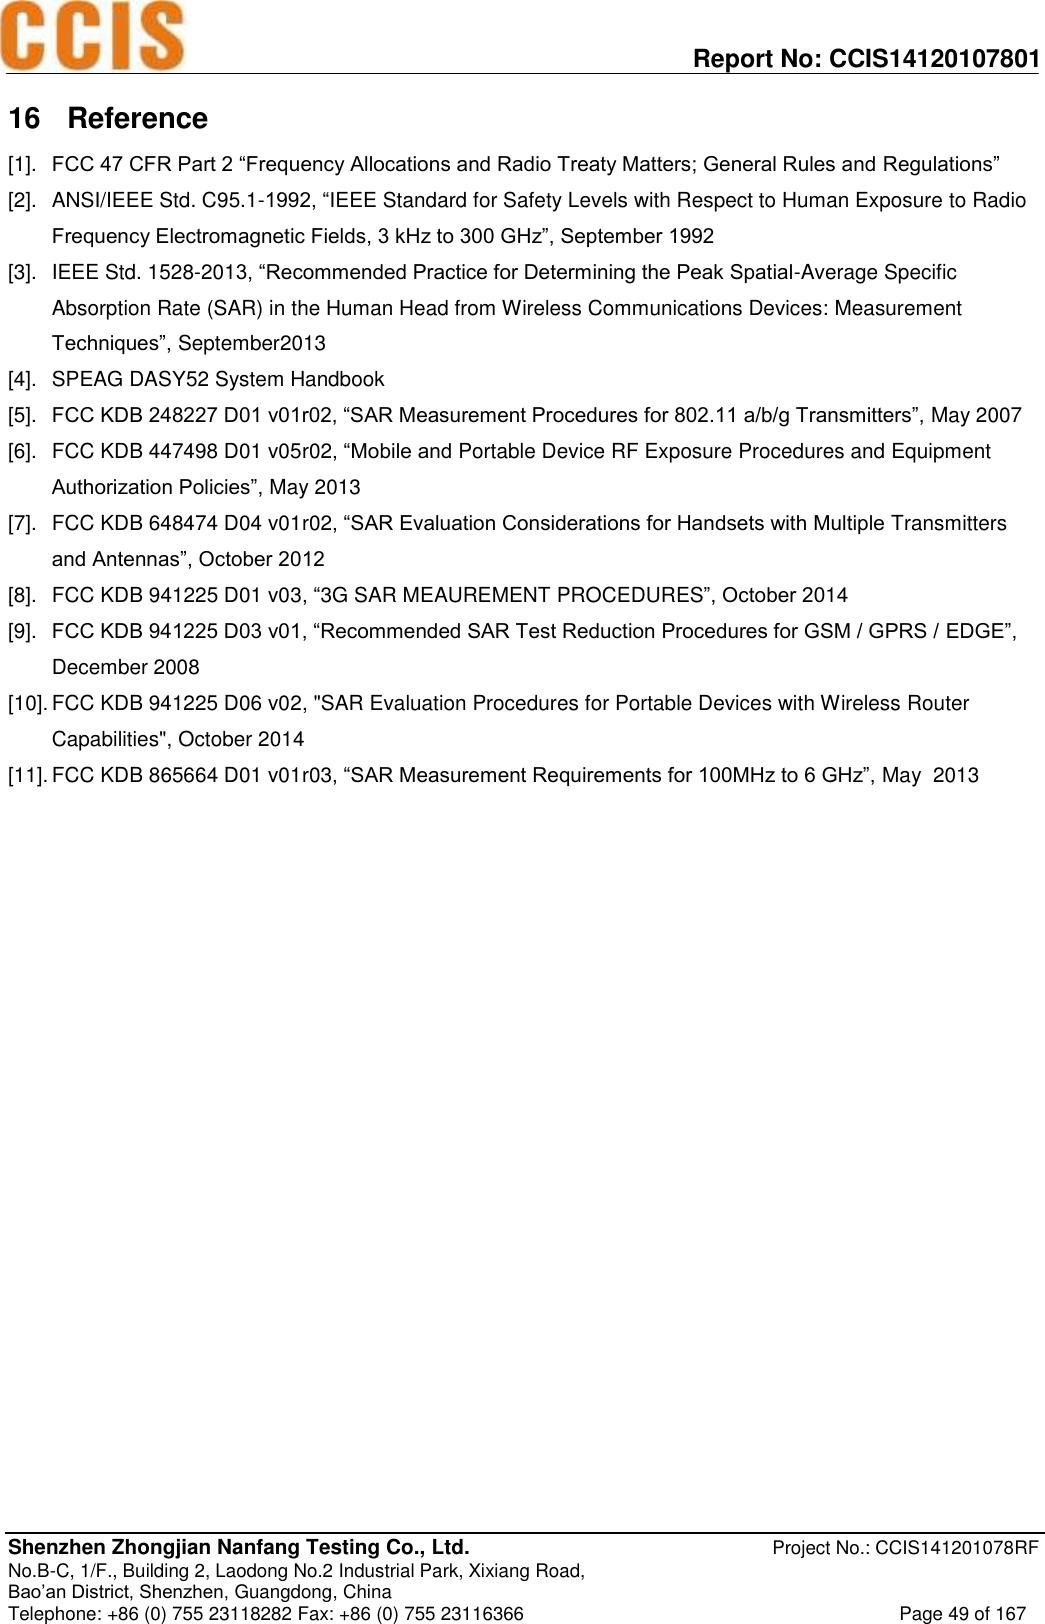 Page 49 of CAPHG28-01 Smart phone-BOOK II series RF Exposure Info HD - Phone Book PNG HD